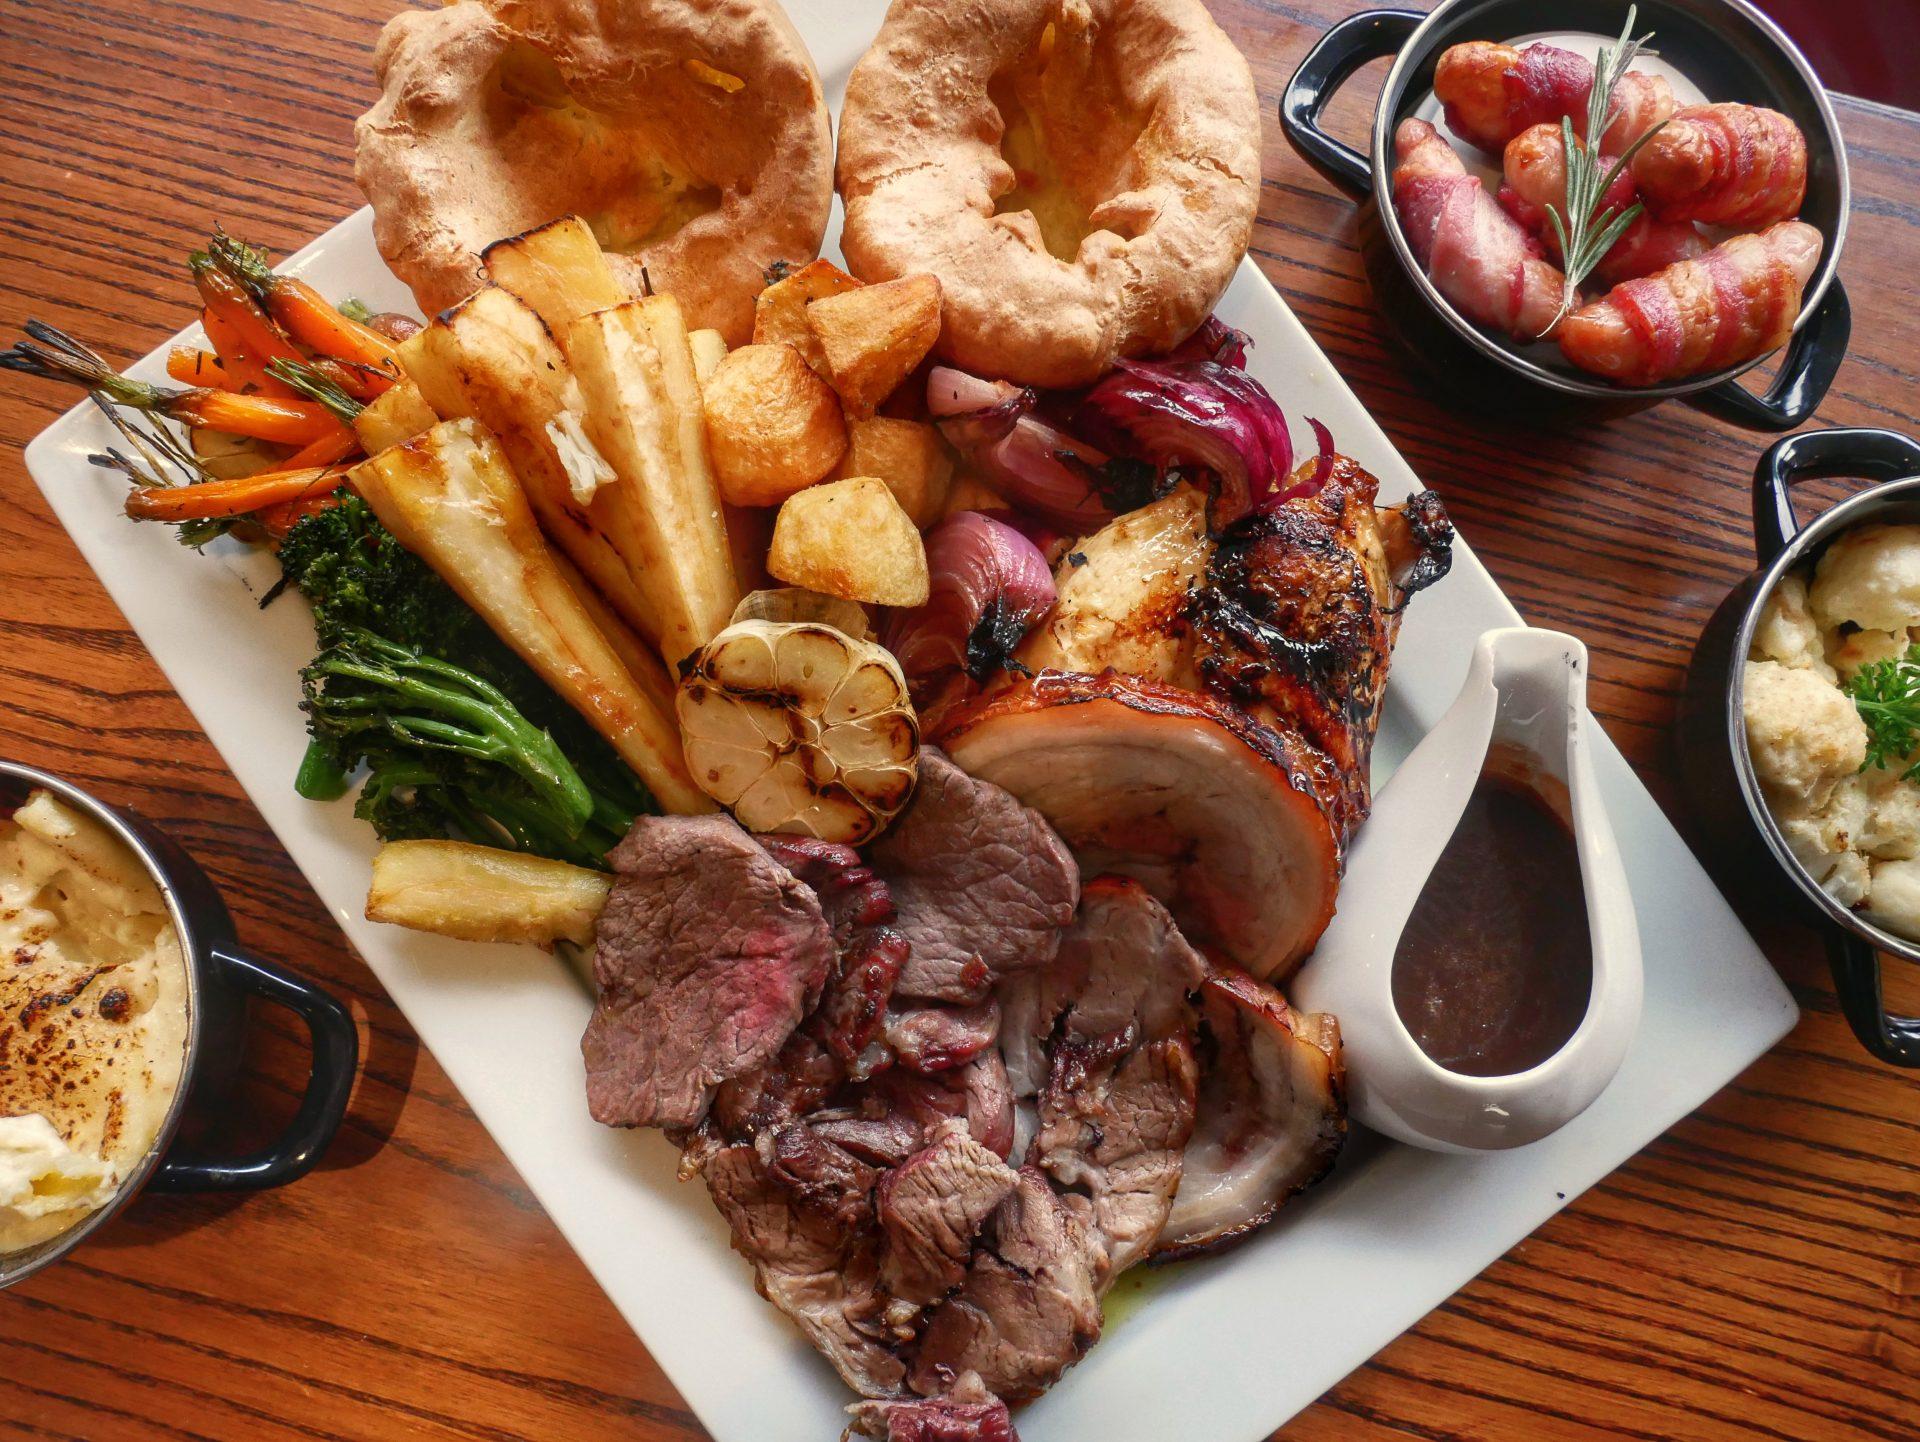 british roast dinner traditional cuisine